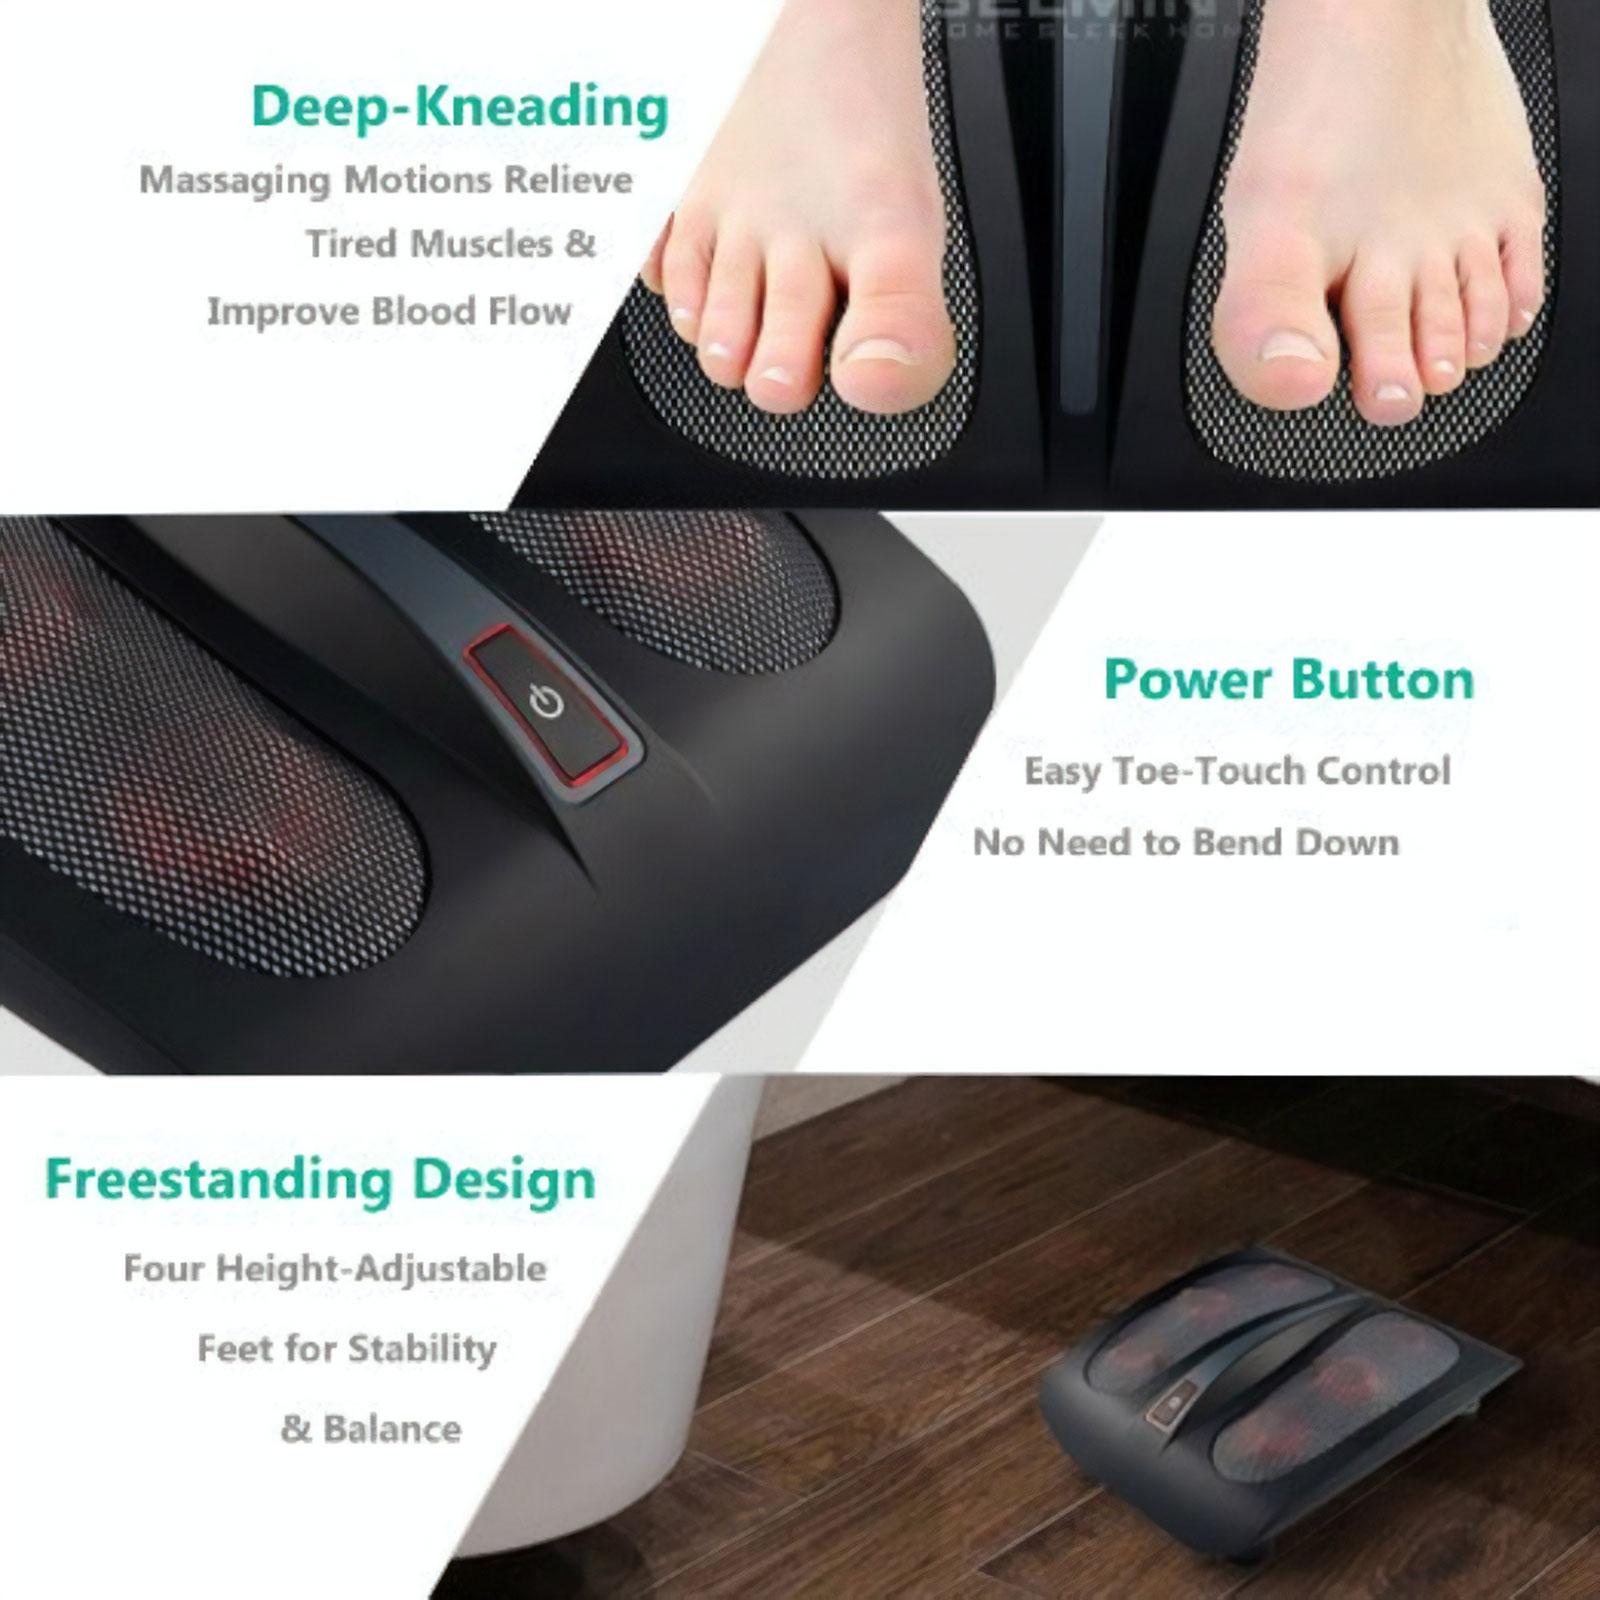 Belmint Shiatsu Foot Massager w/ Built-In Heat Function - Deep Kneading Therapy 3